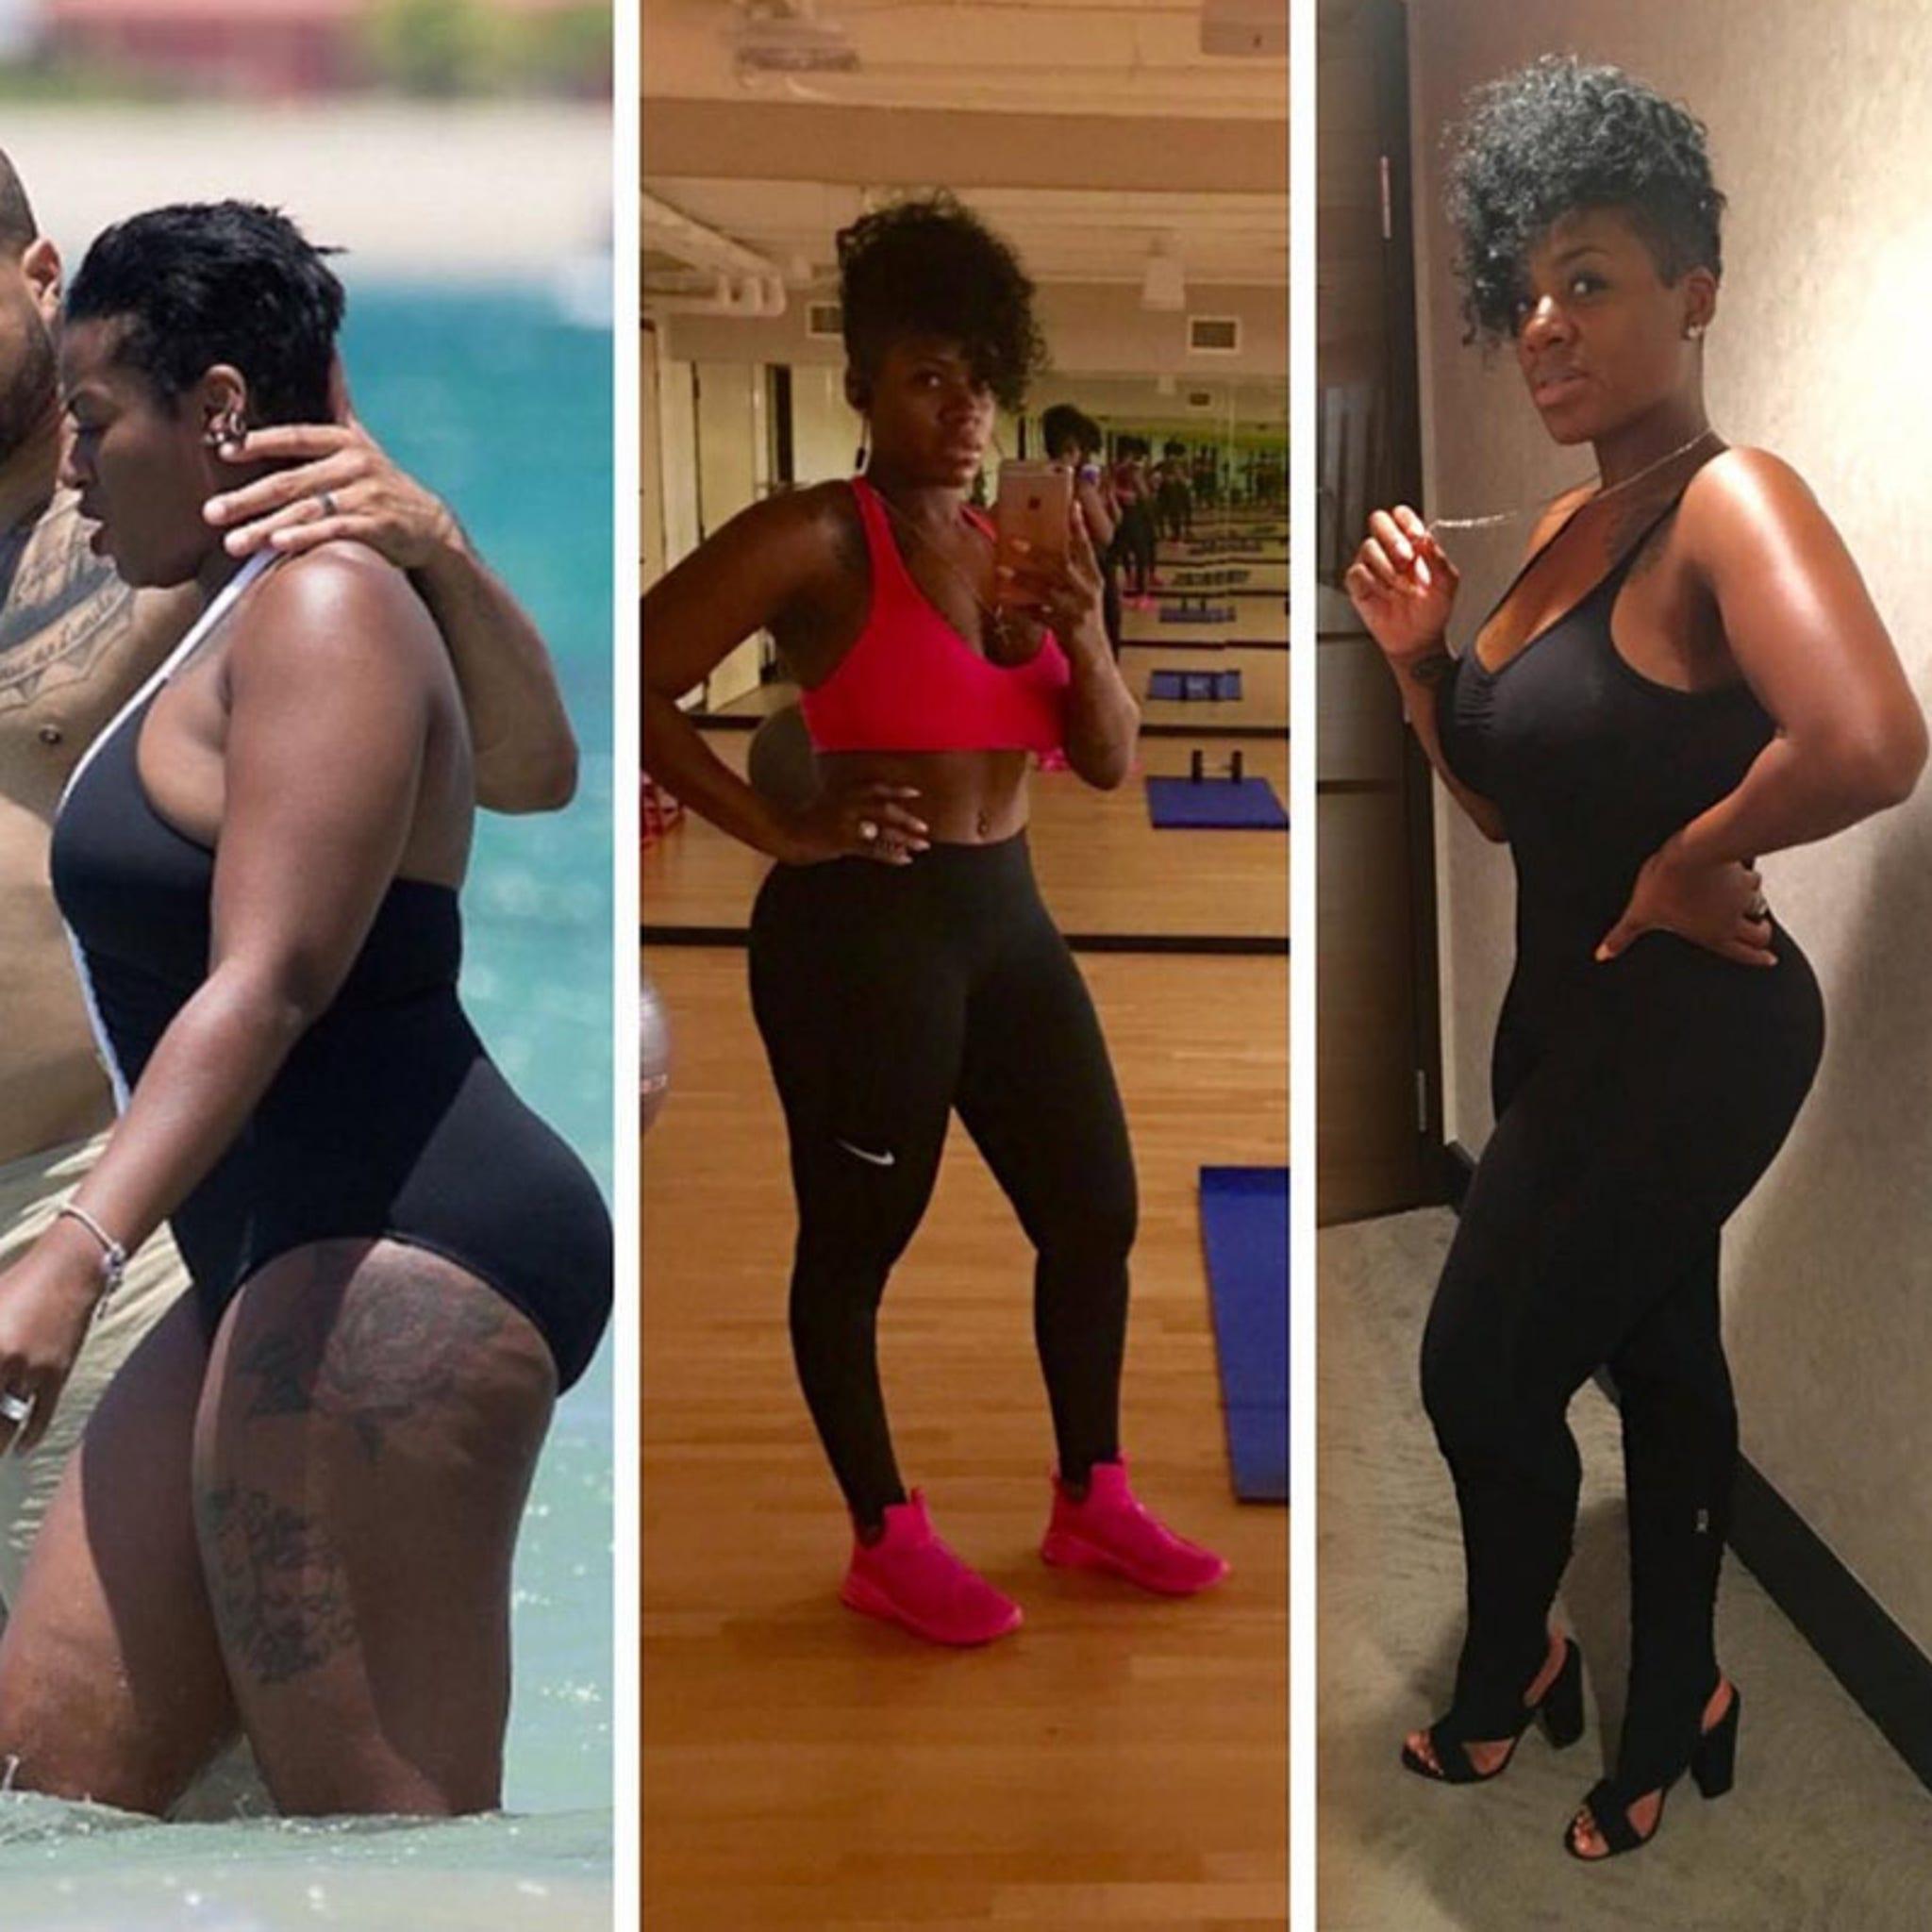 Fantasia Barrino Flaunts Impressive Weight Loss I Feel Great